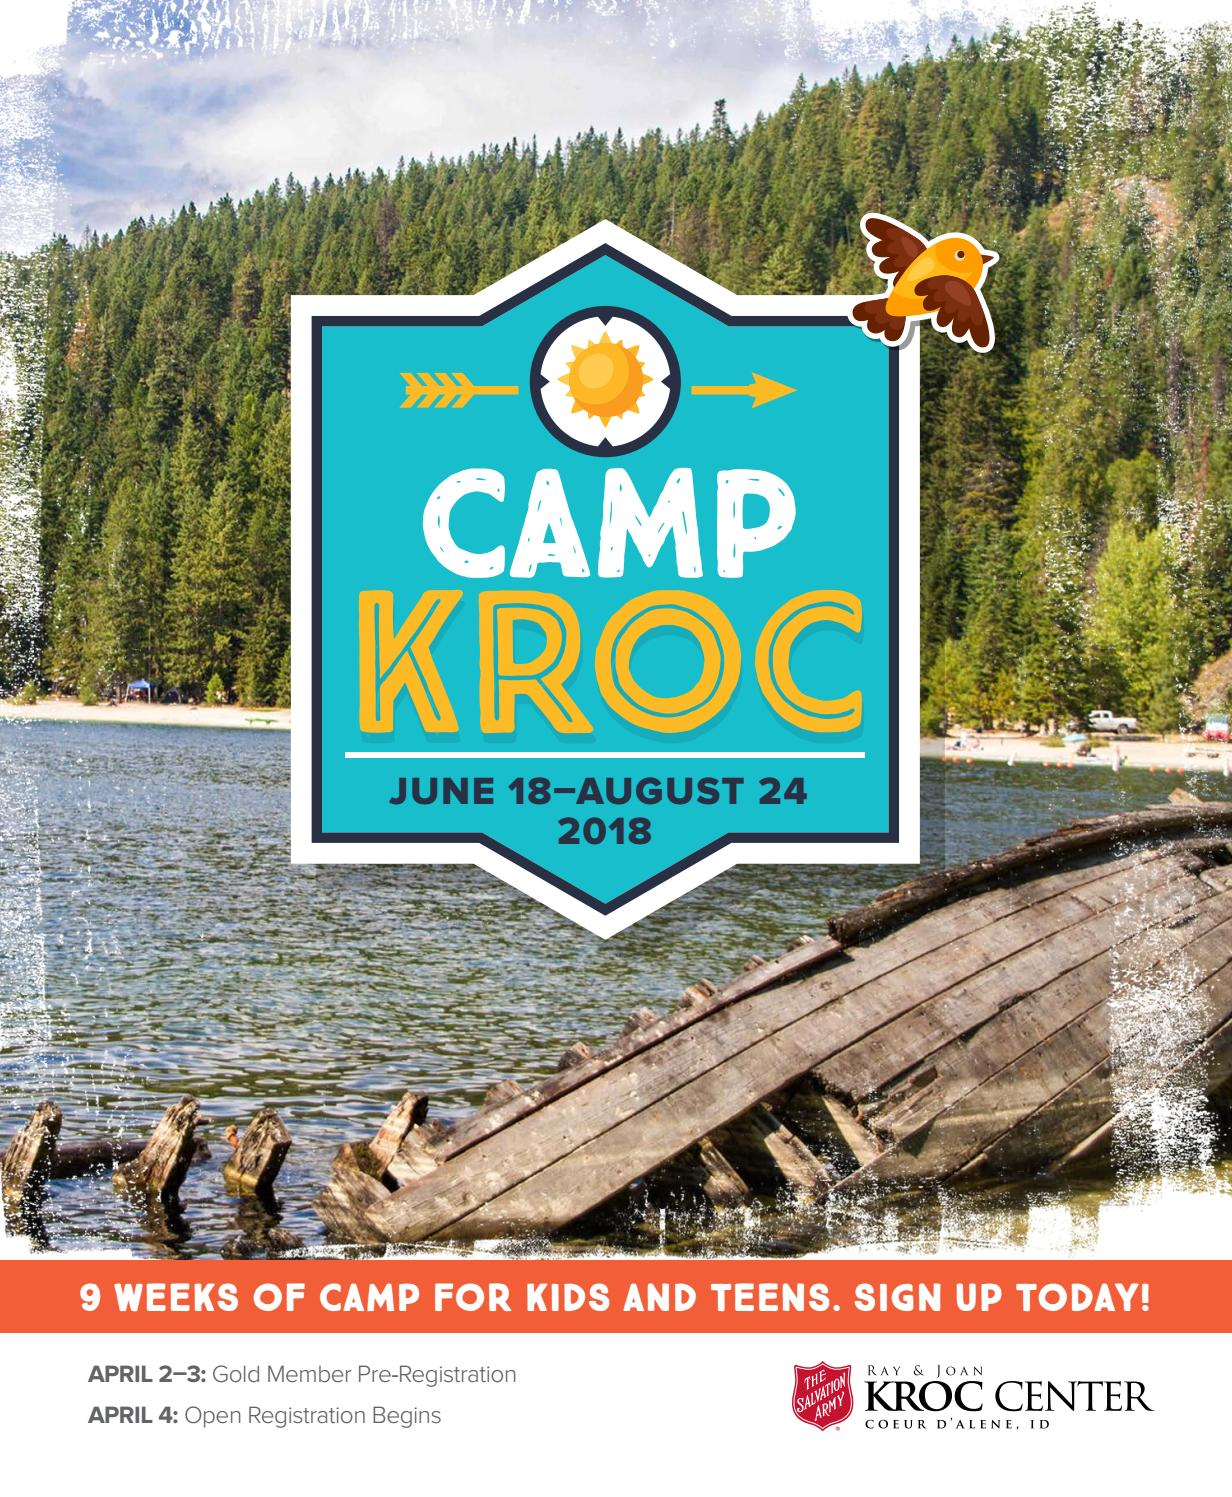 Camp Kroc 2018 Brochure By The Salvation Army Kroc Center Coeur D